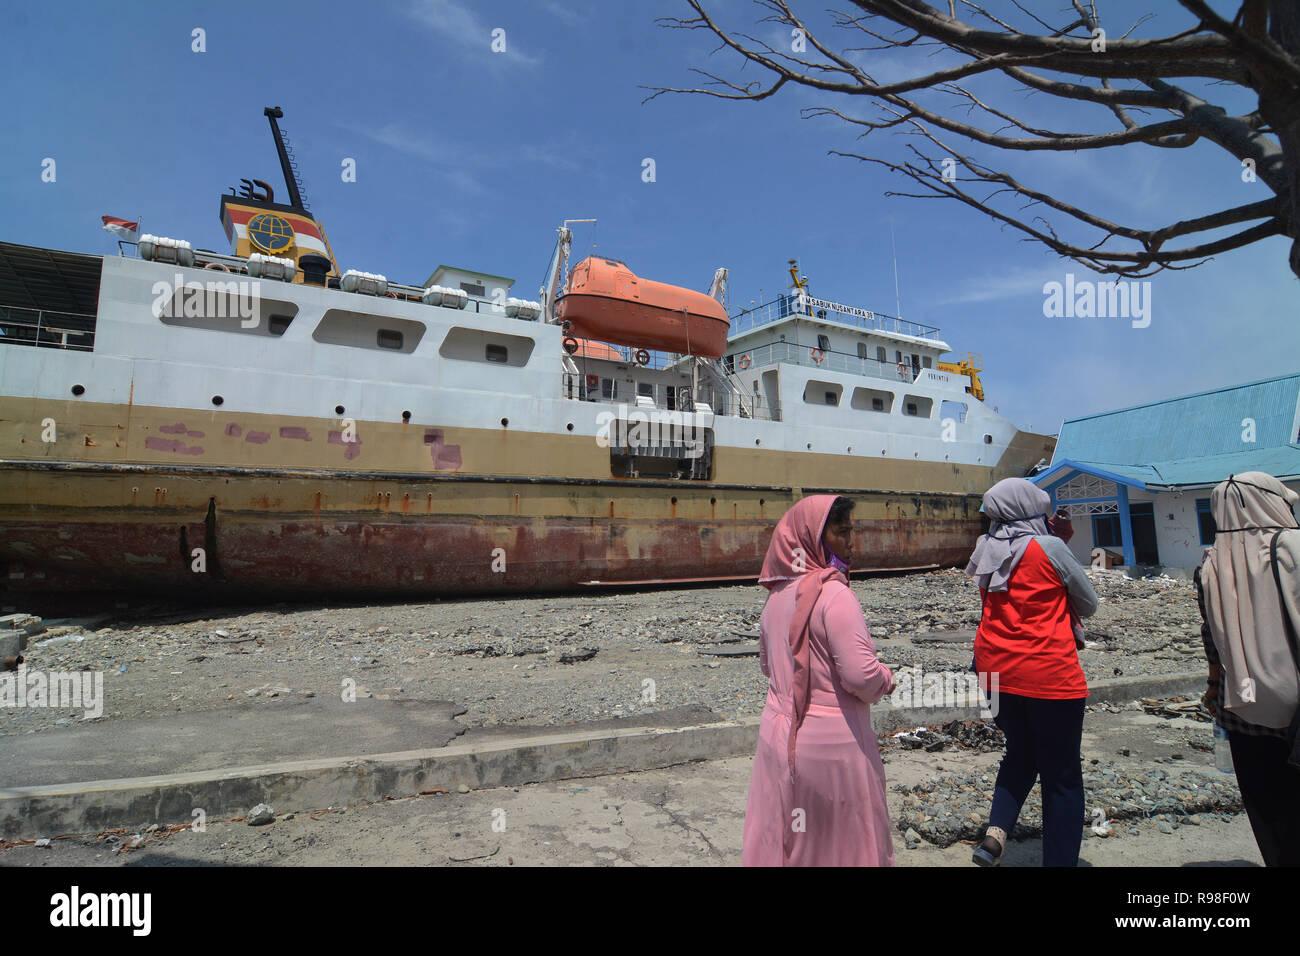 Residents move near KM Sabuk Nusantara which crashed ashore due to the tsunami in Wani, Donggala, Central Sulawesi, Saturday (November 3, 2018). - Stock Image